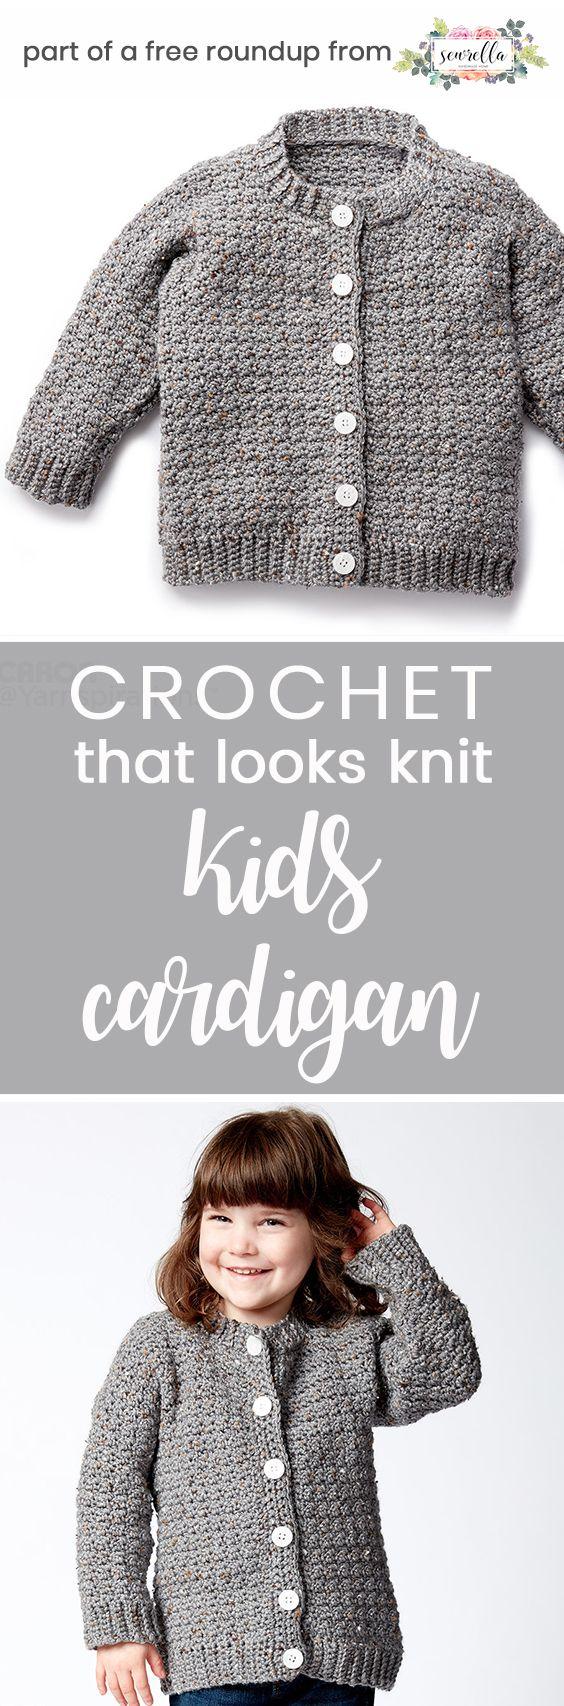 Kids Crochet Patterns that Look Knit | Gabo, Tejido y Patrón gratis